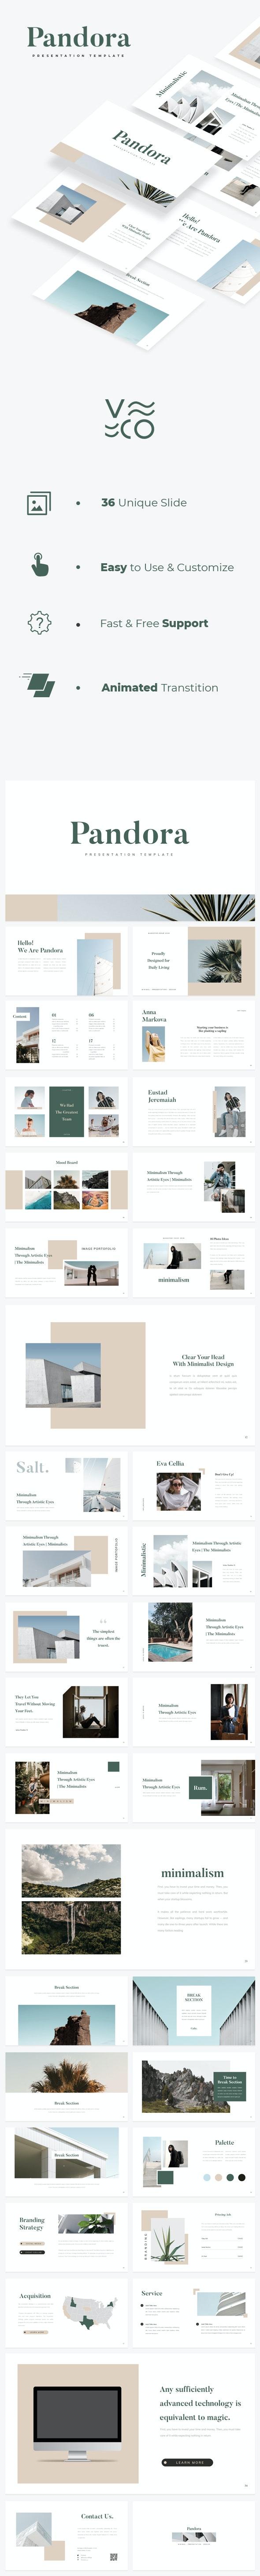 Pandora Google Slides - Google Slides Presentation Templates